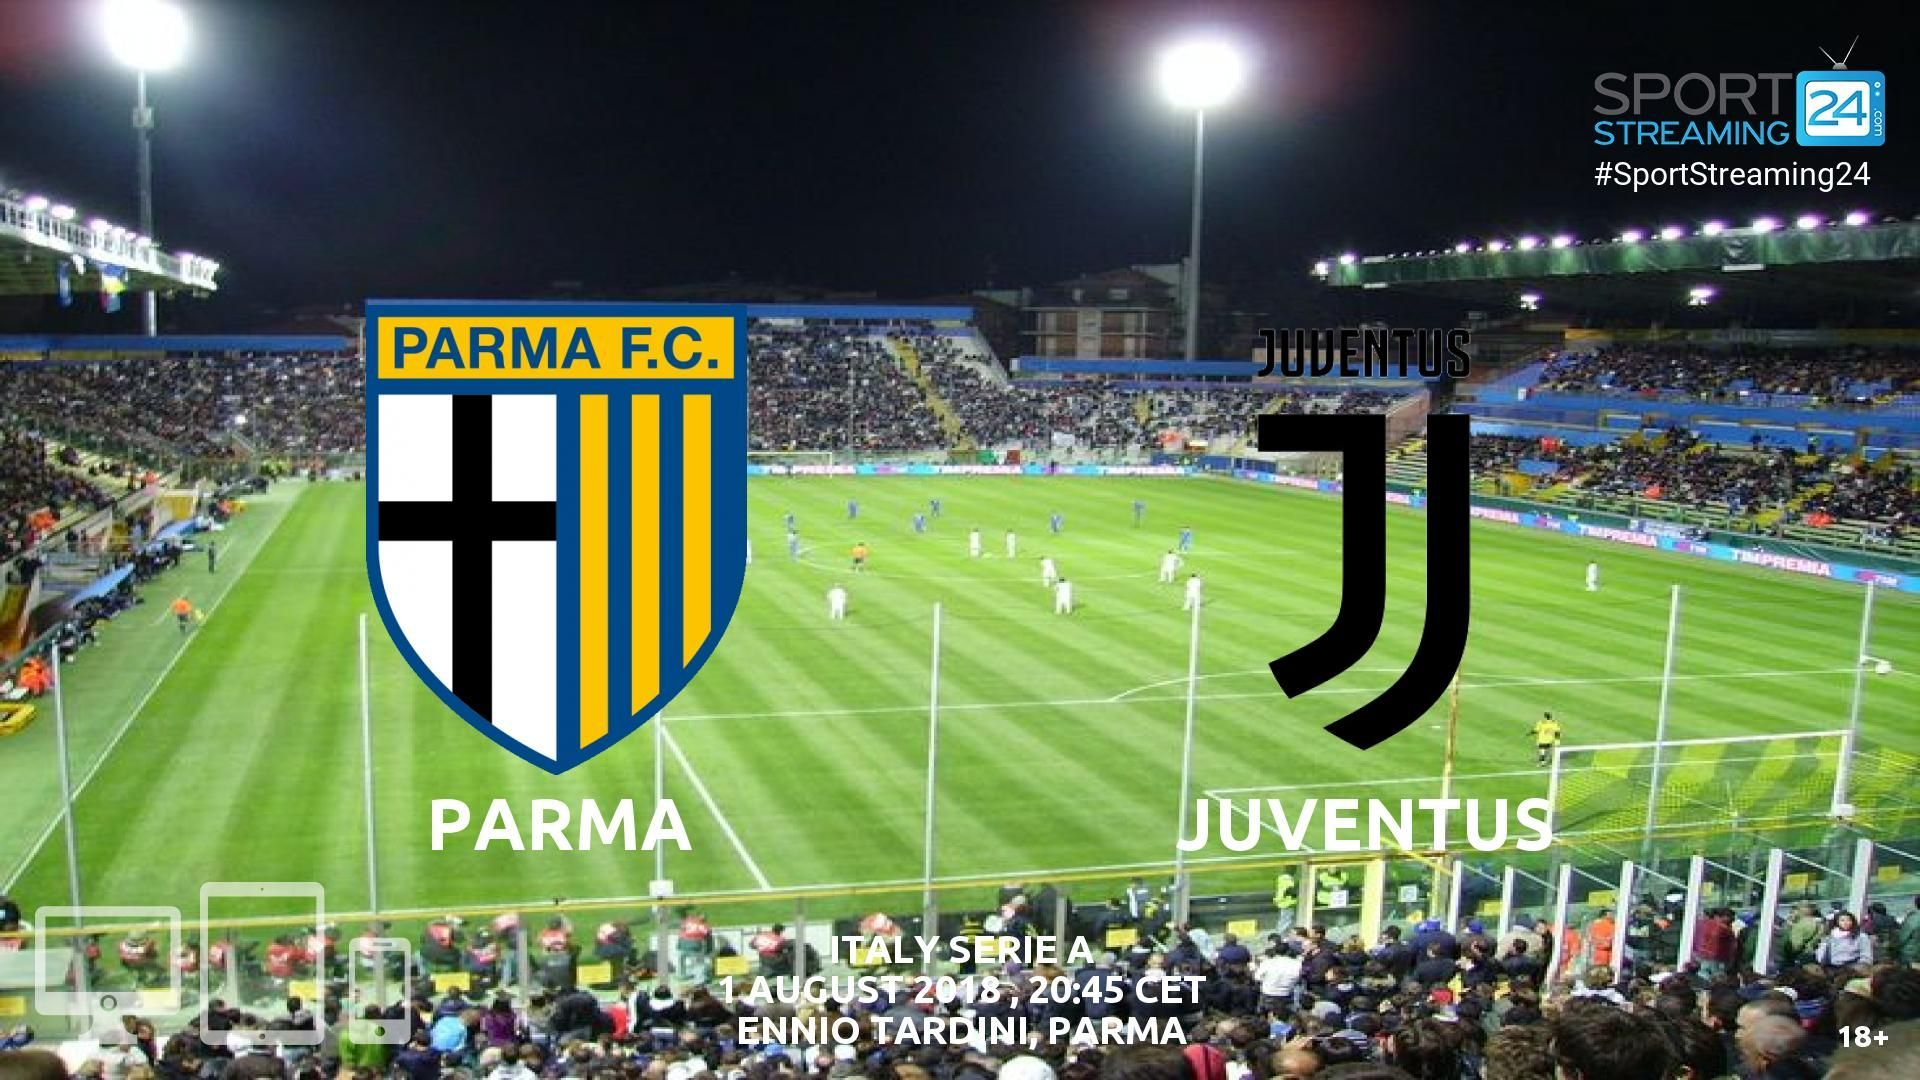 Parma v Juventus Live Streaming Football Juventus live